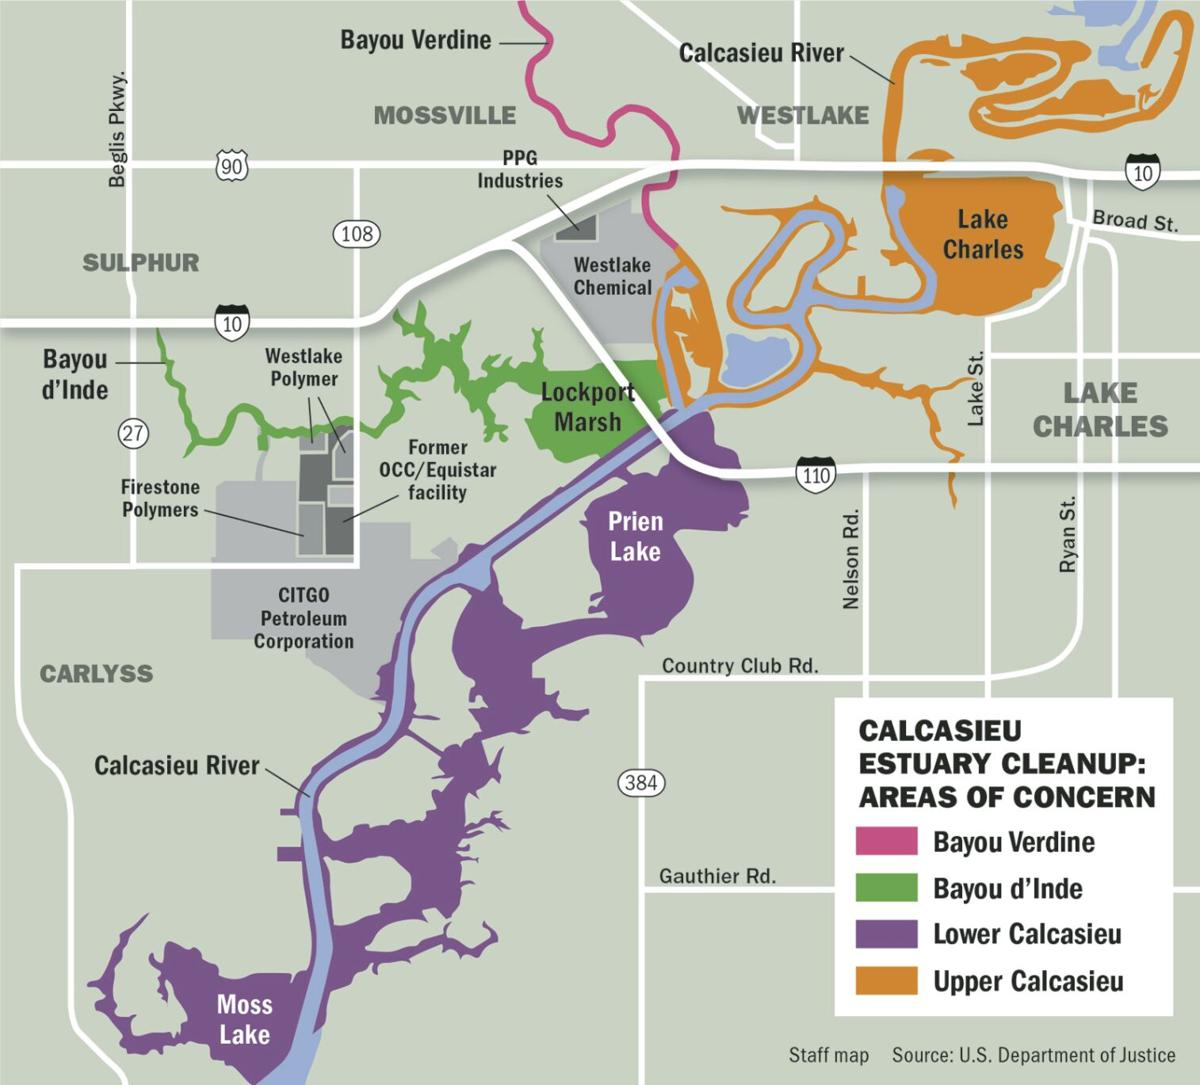 Calcasieu estuary cleanup map